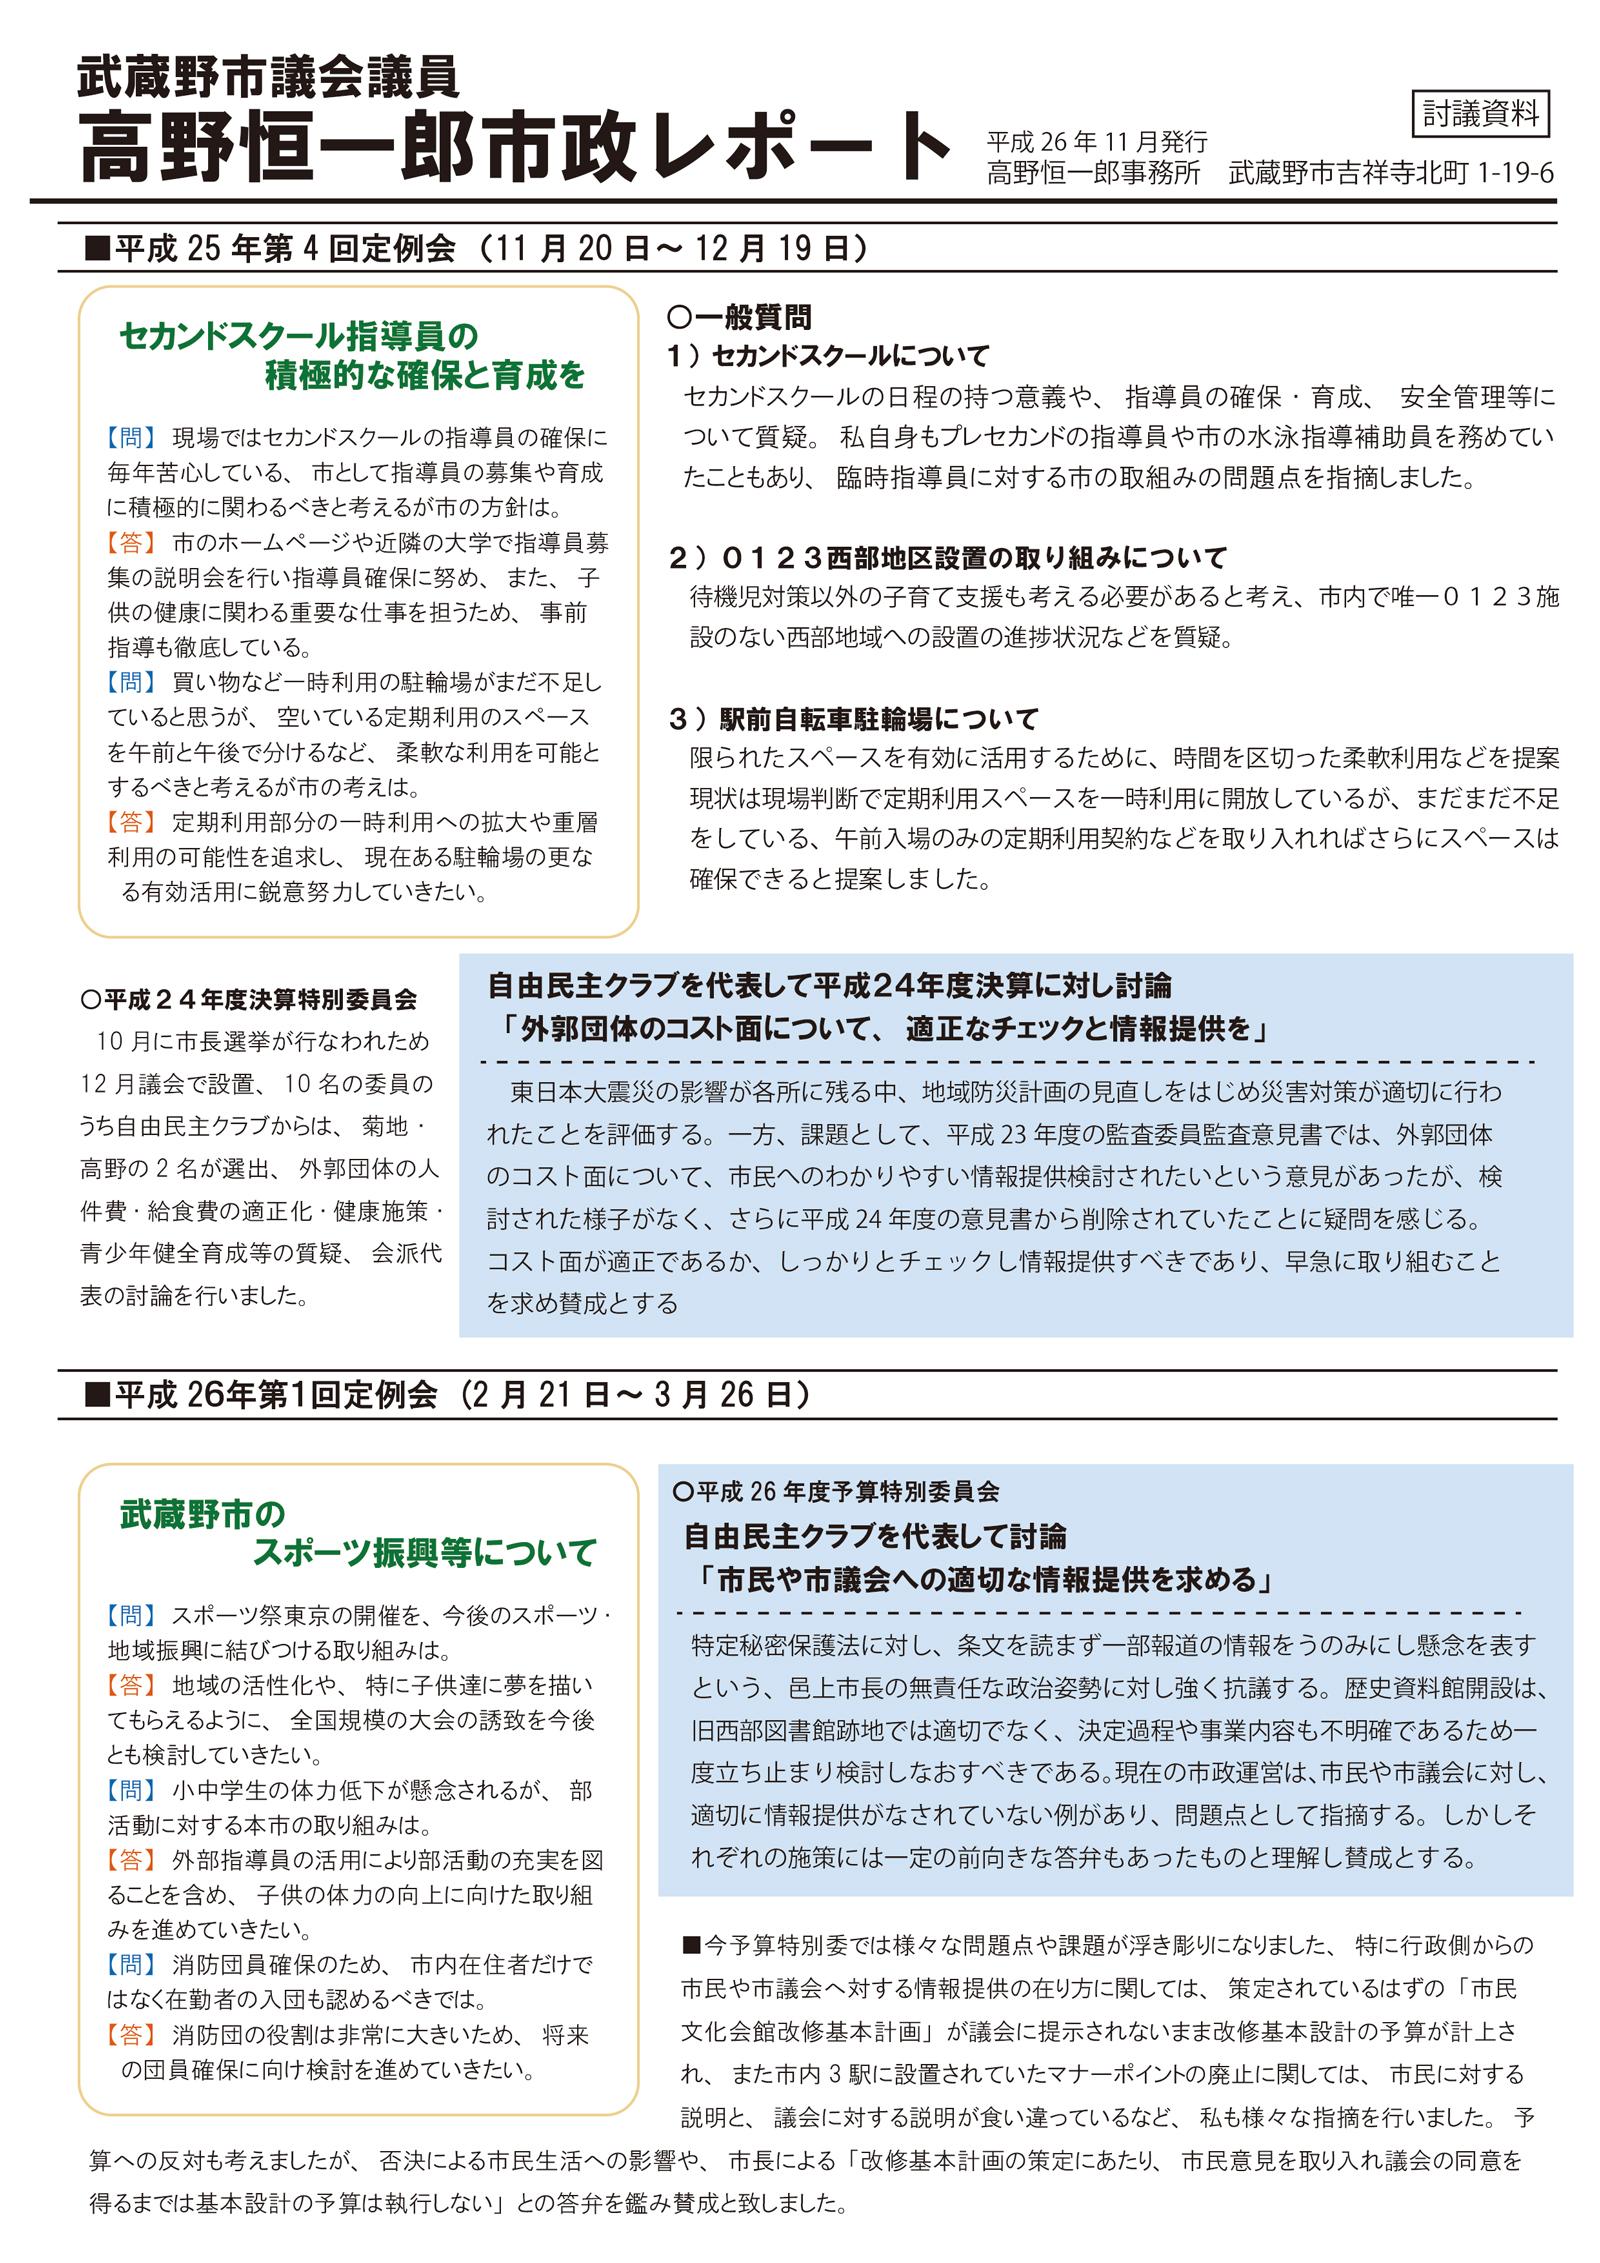 report_26_11-1